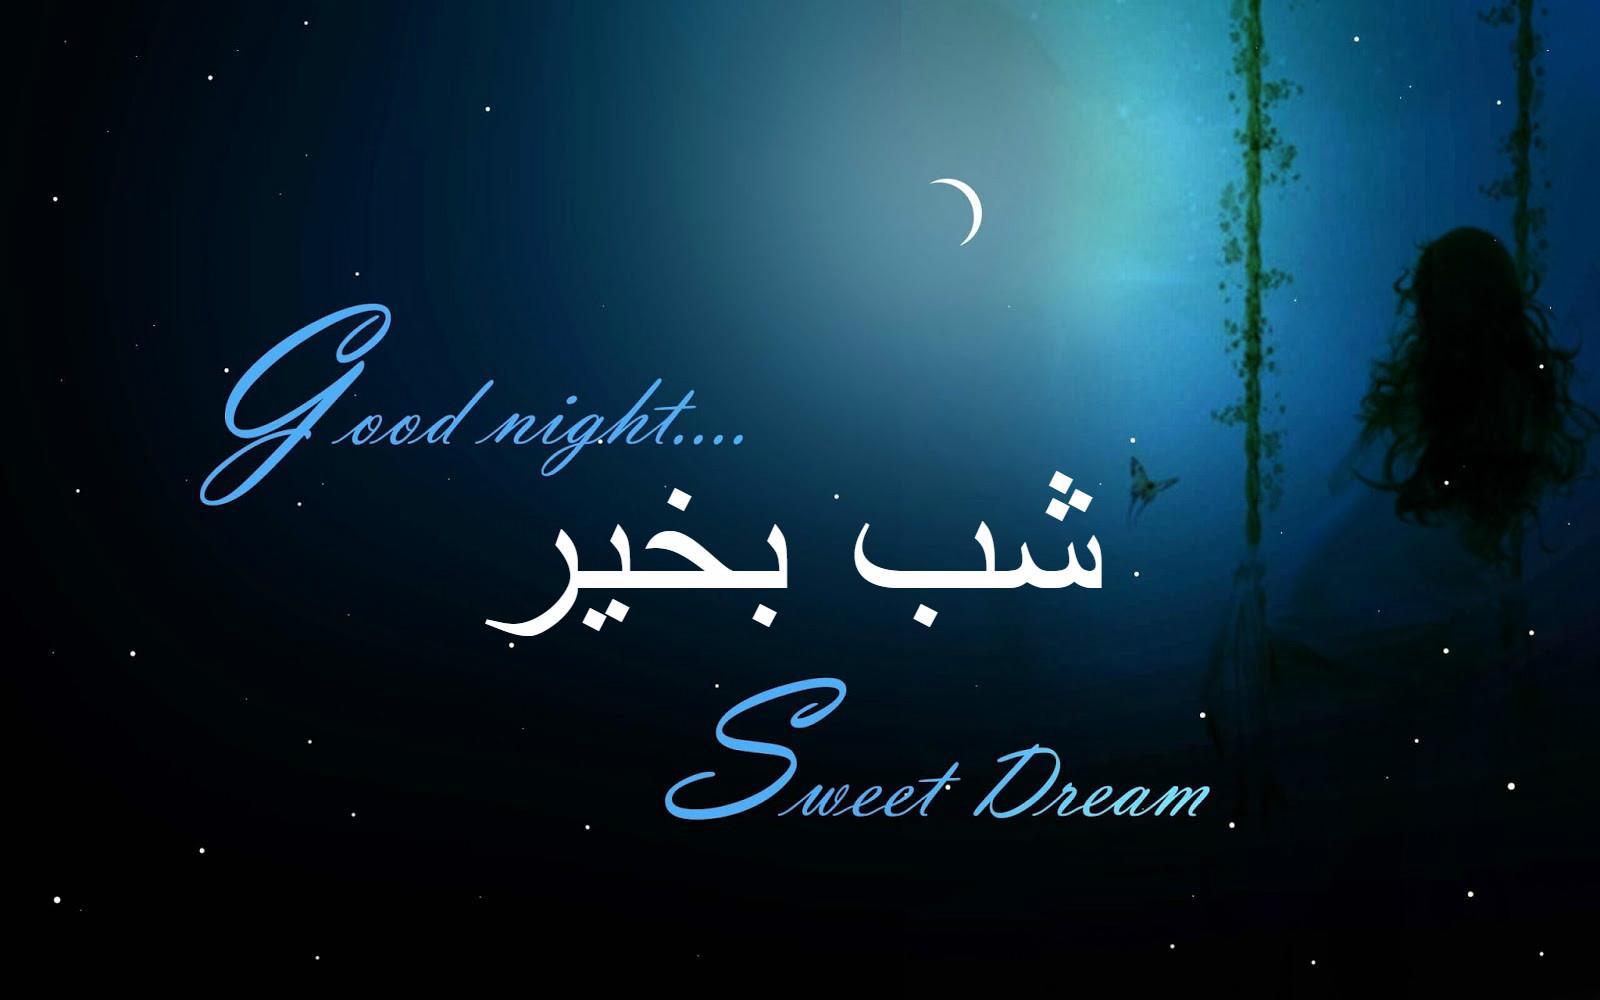 Imagenes De Good Night Quotes In Urdu